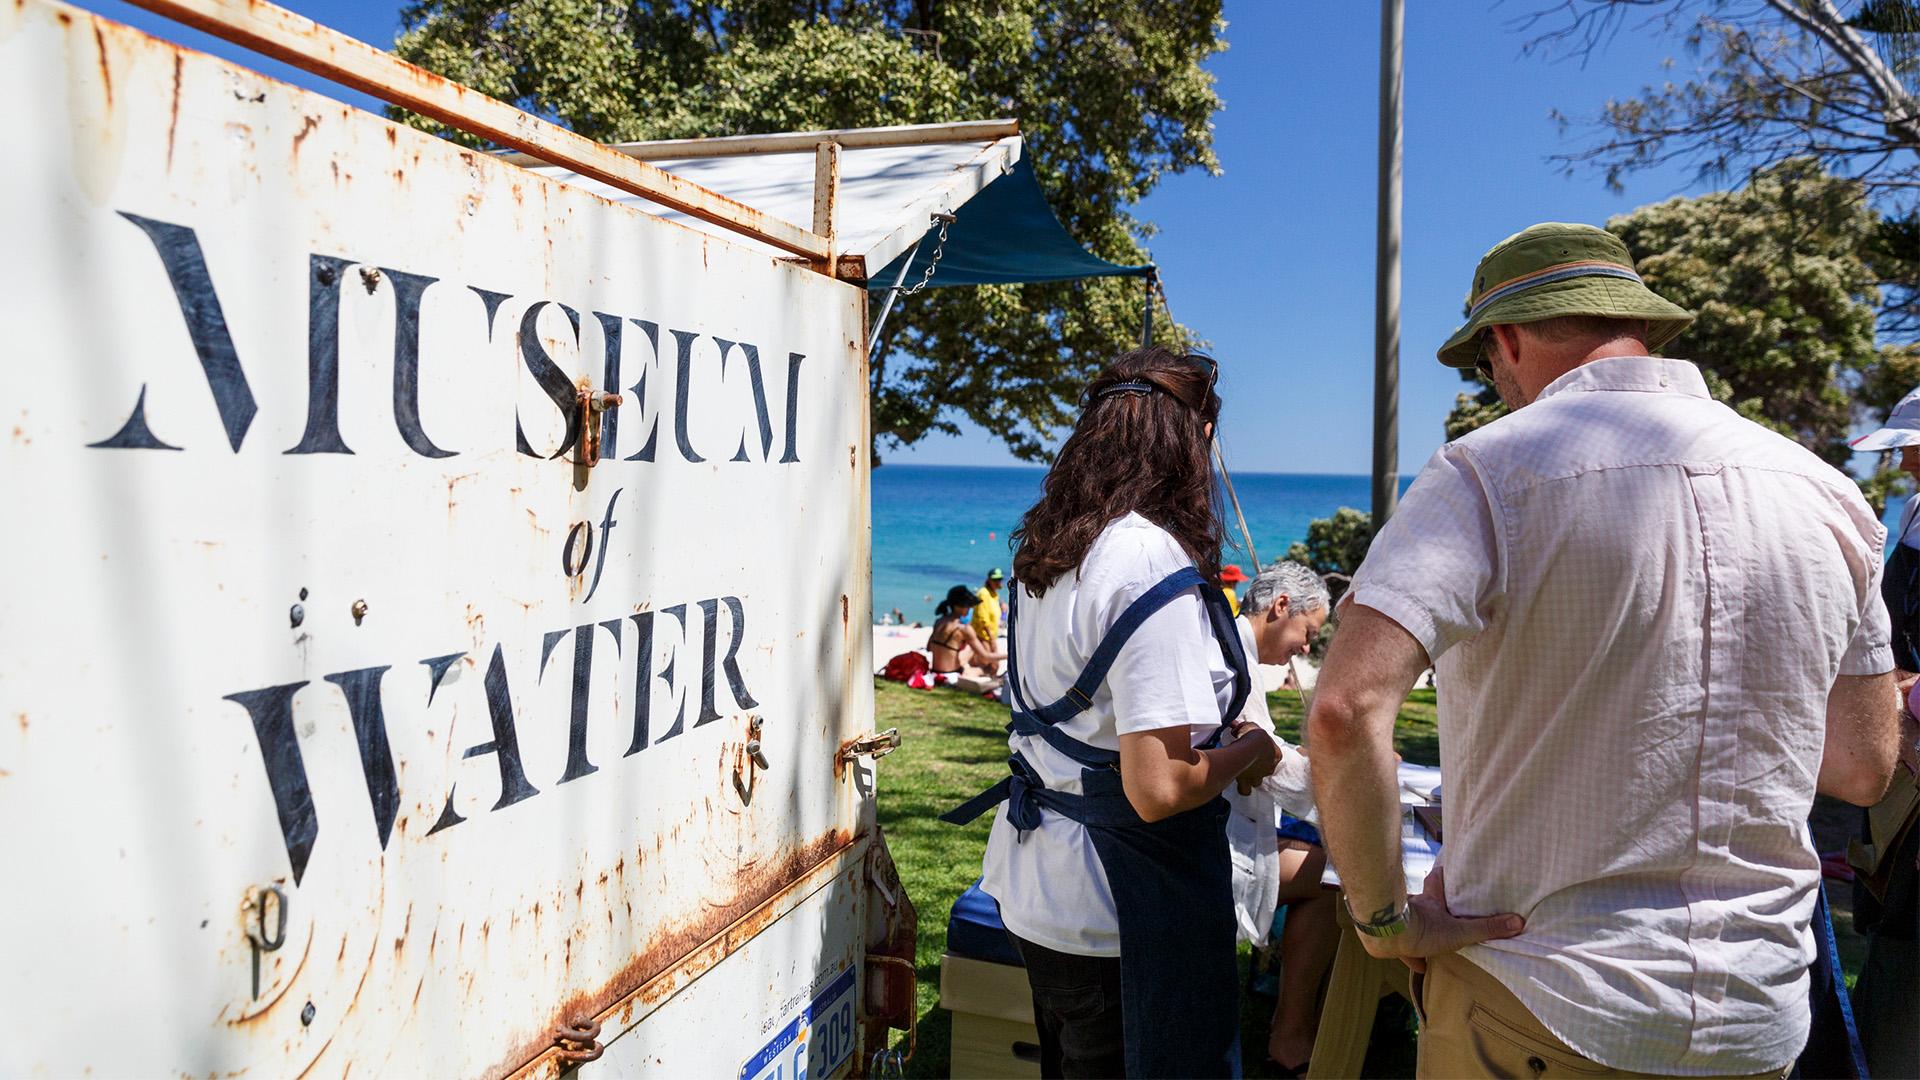 Museum of Water (Perth Festival) [Perth]